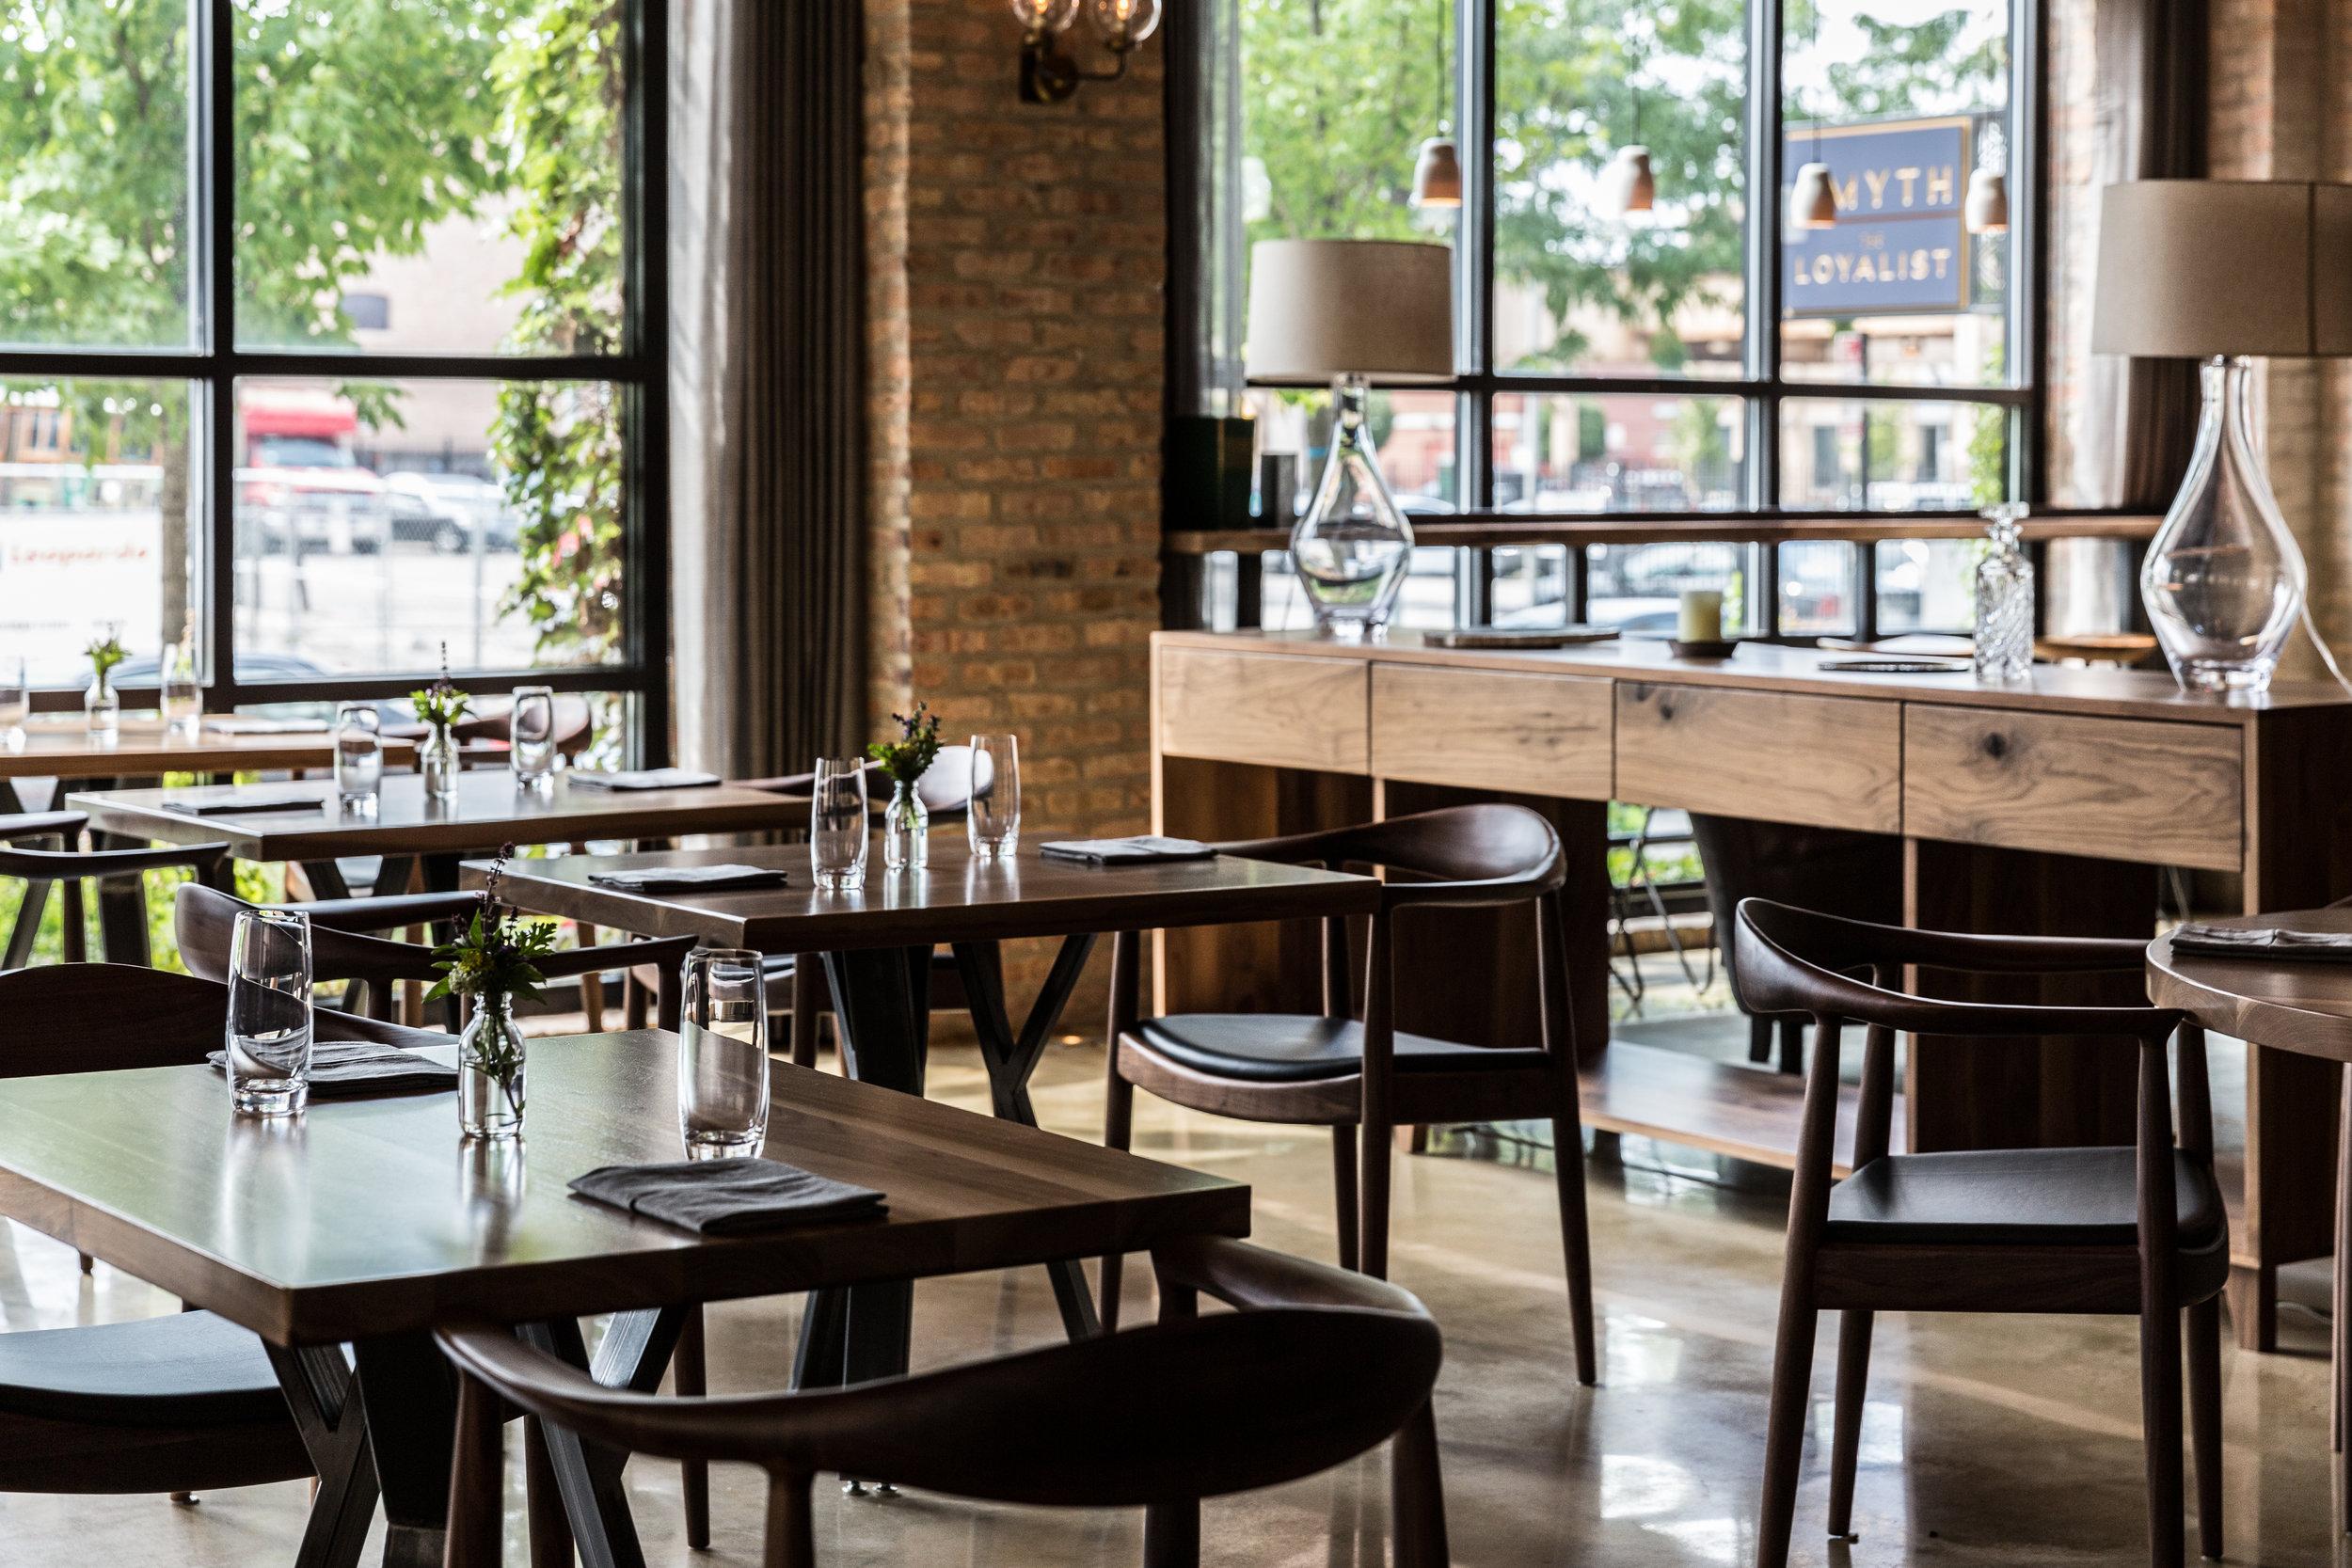 studio-saint-bars-and-restaurants-smyth-and-the-loyalist-washington-dc-3